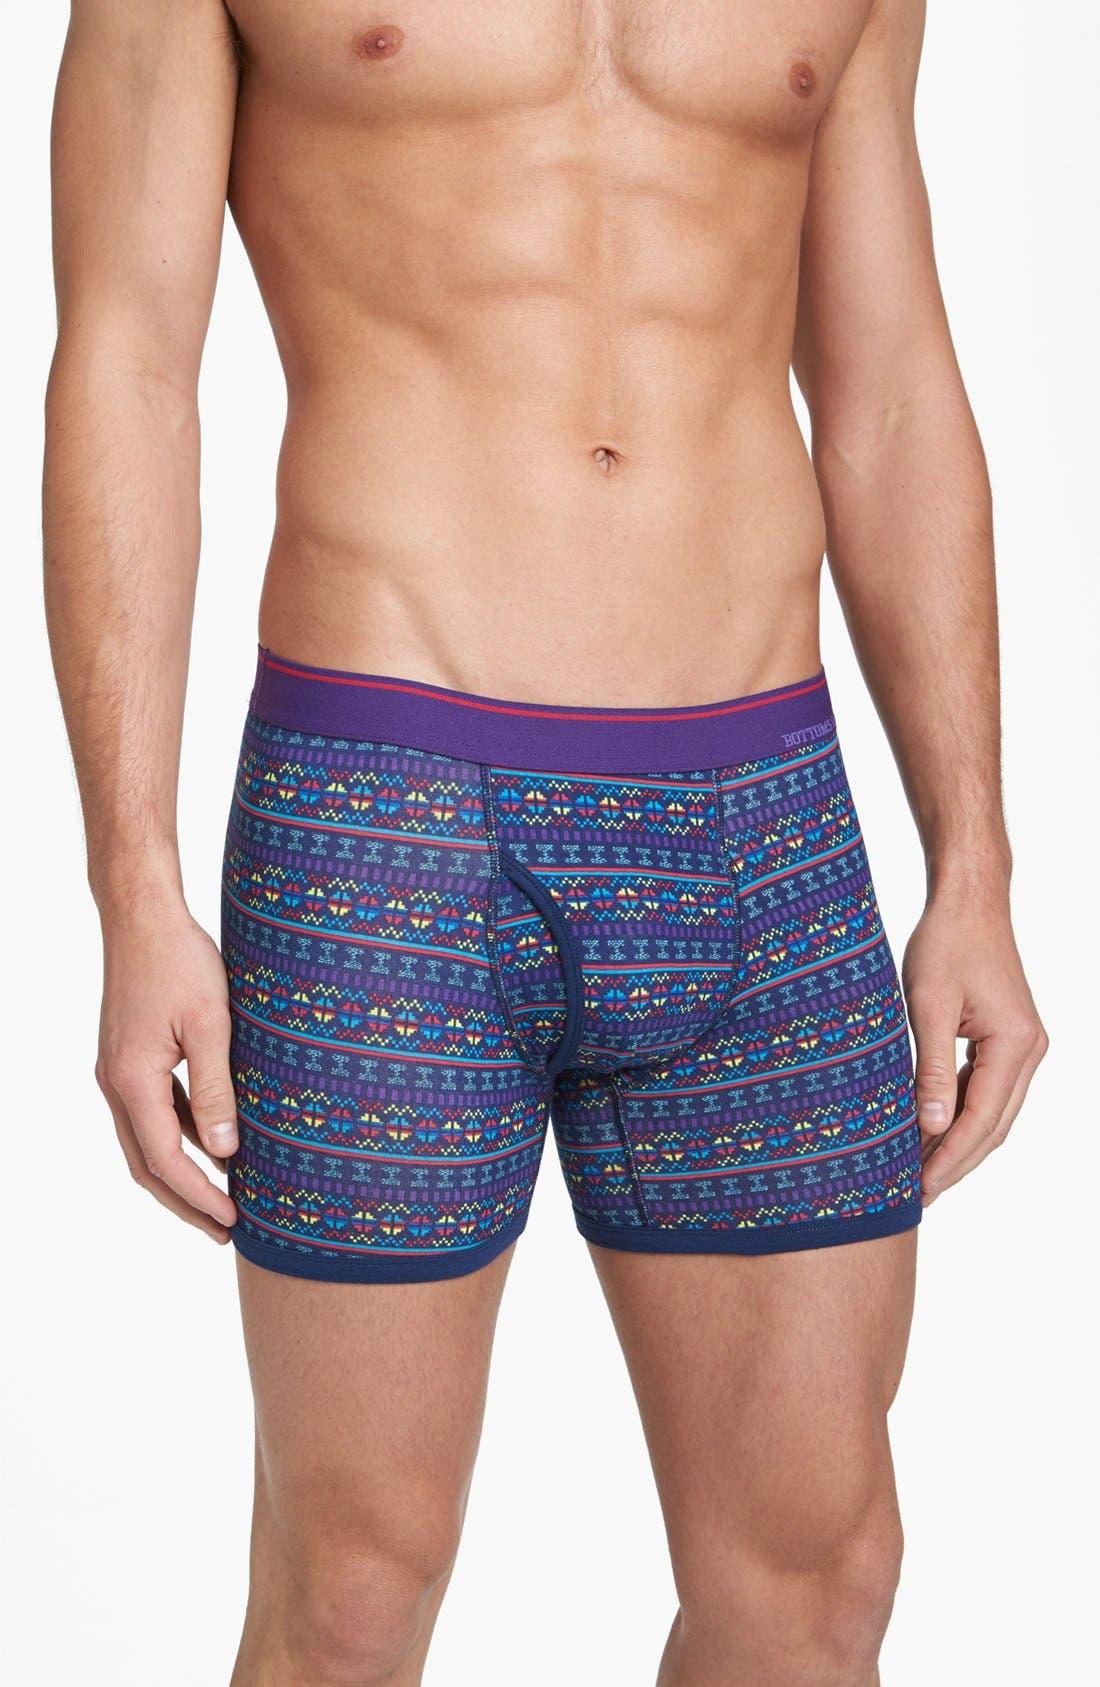 Alternate Image 3  - Basic Underwear 'Bottoms Out' Pattern Boxer Briefs (3-Pack)